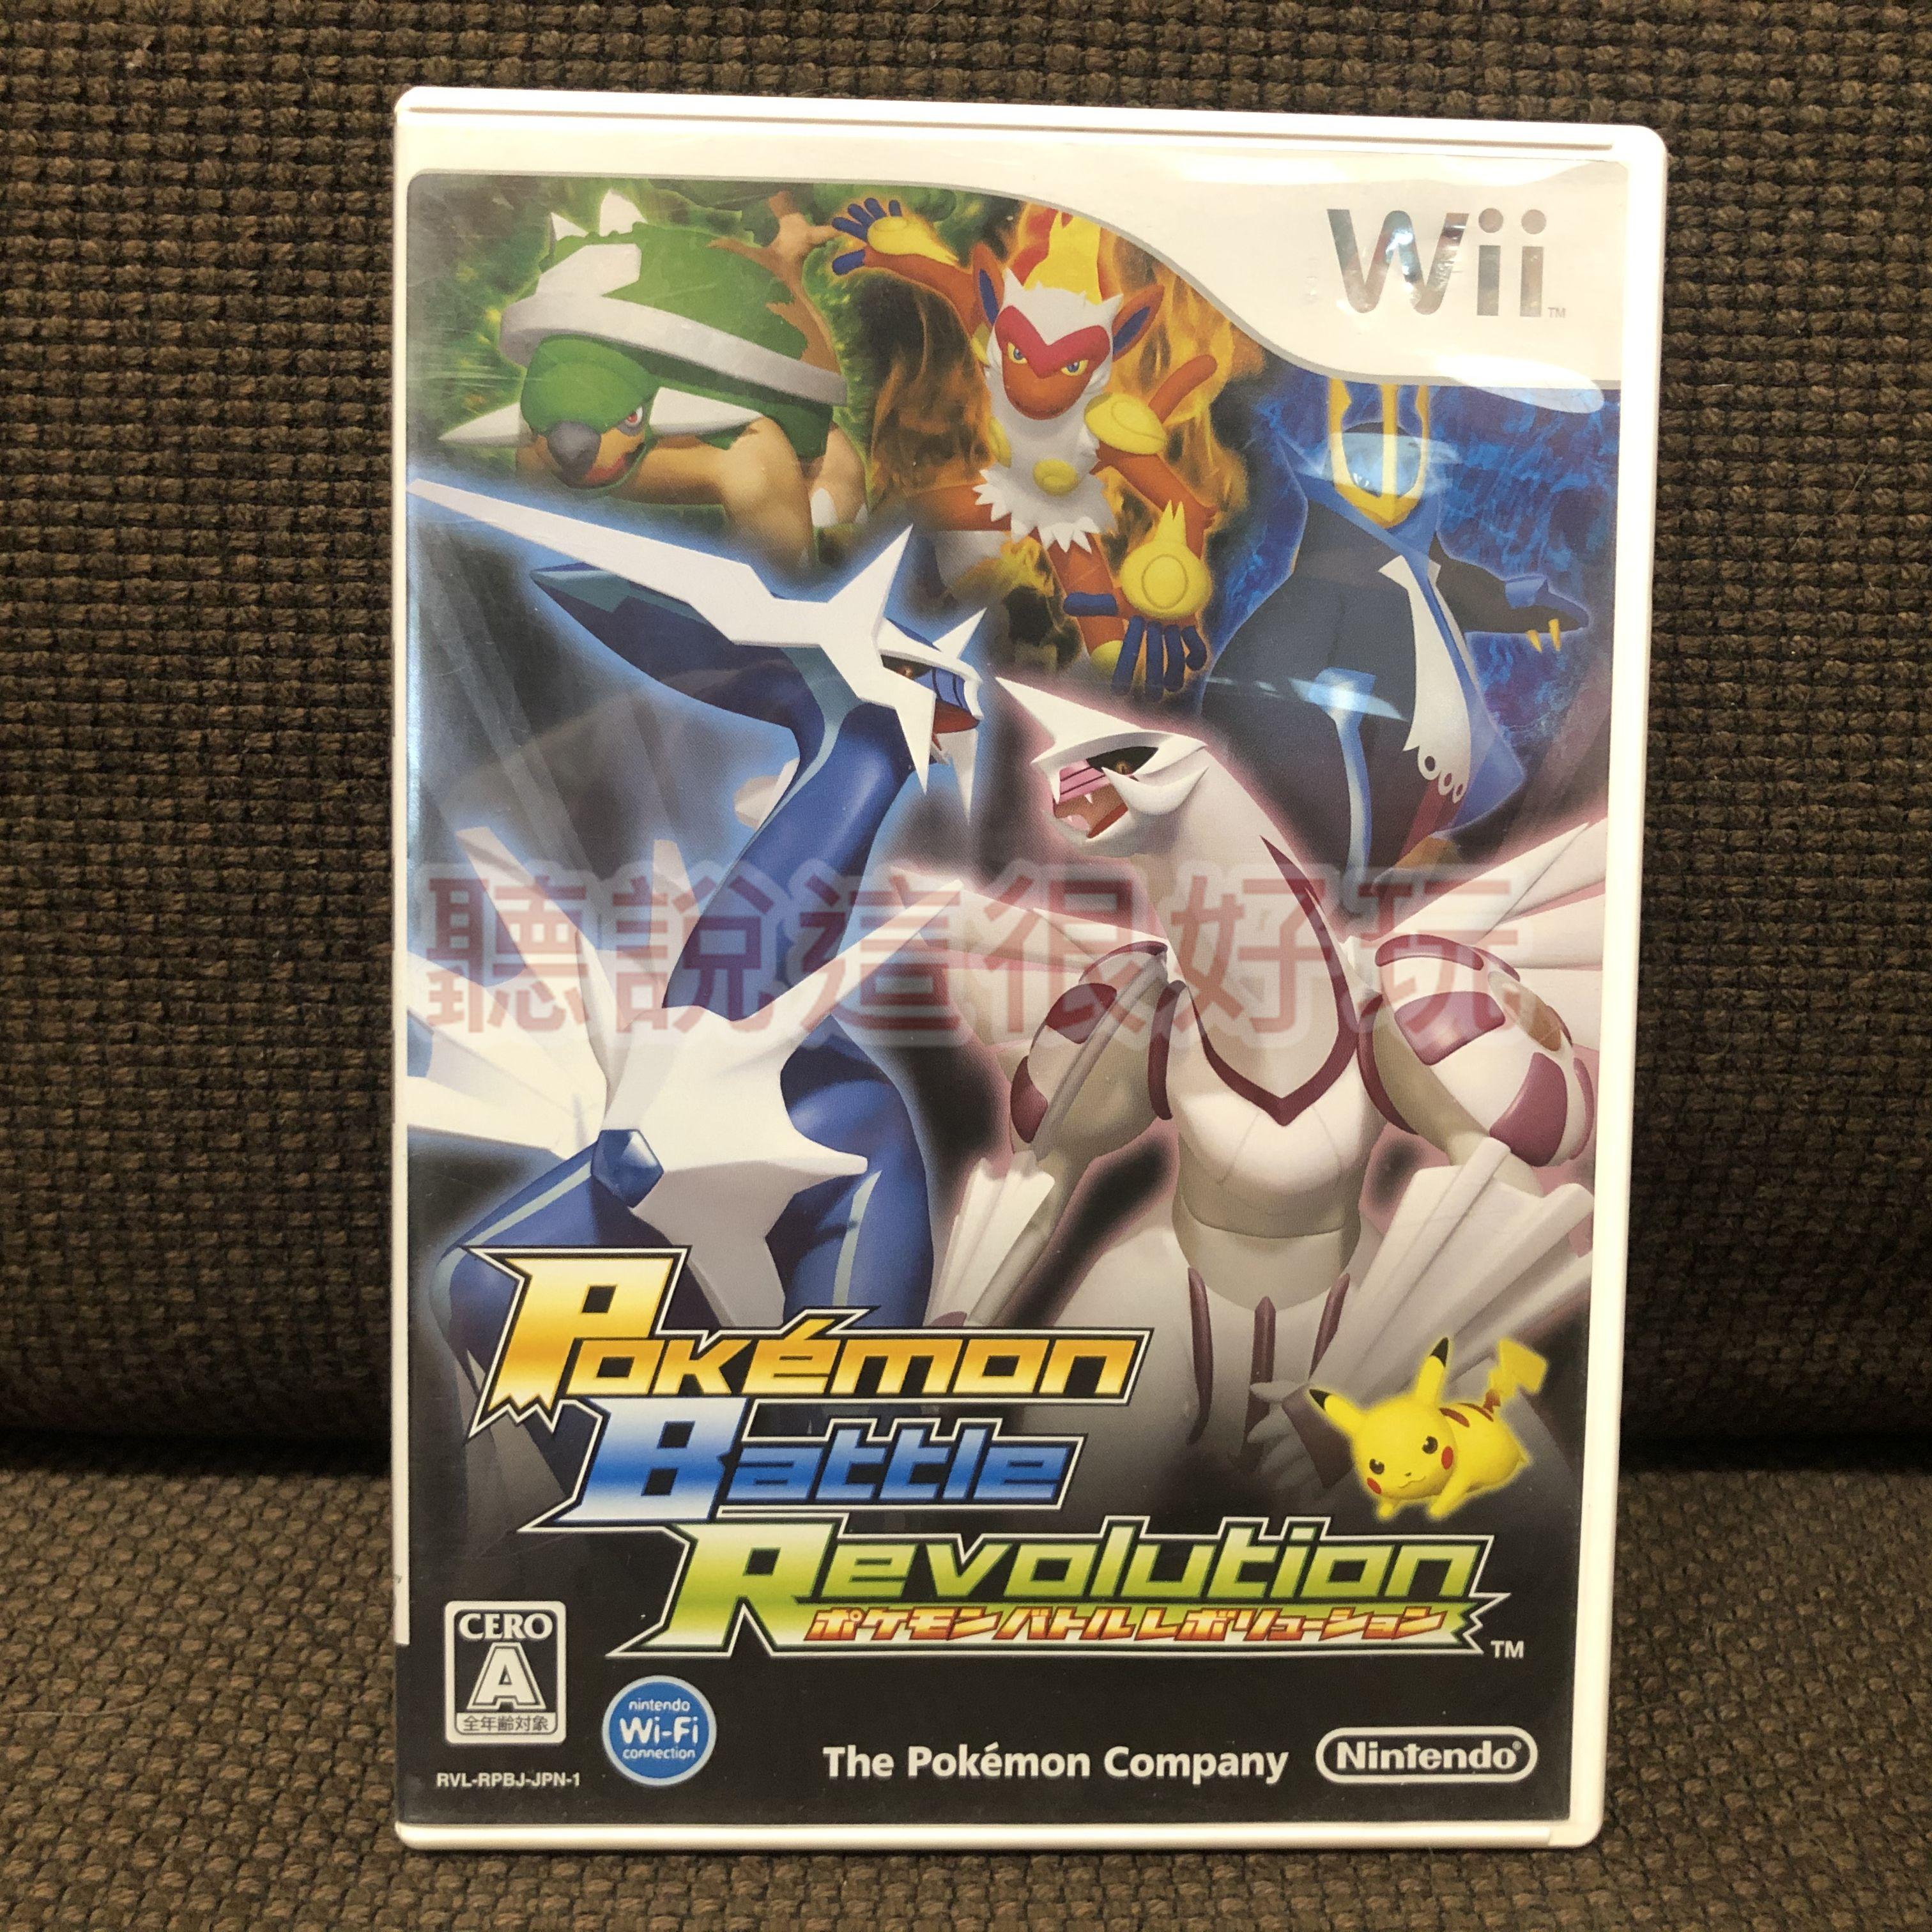 滿千免運 Wii 神奇寶貝 戰鬥革命 Pokemon Battle Revolution 寶可夢 遊戲 4 V076